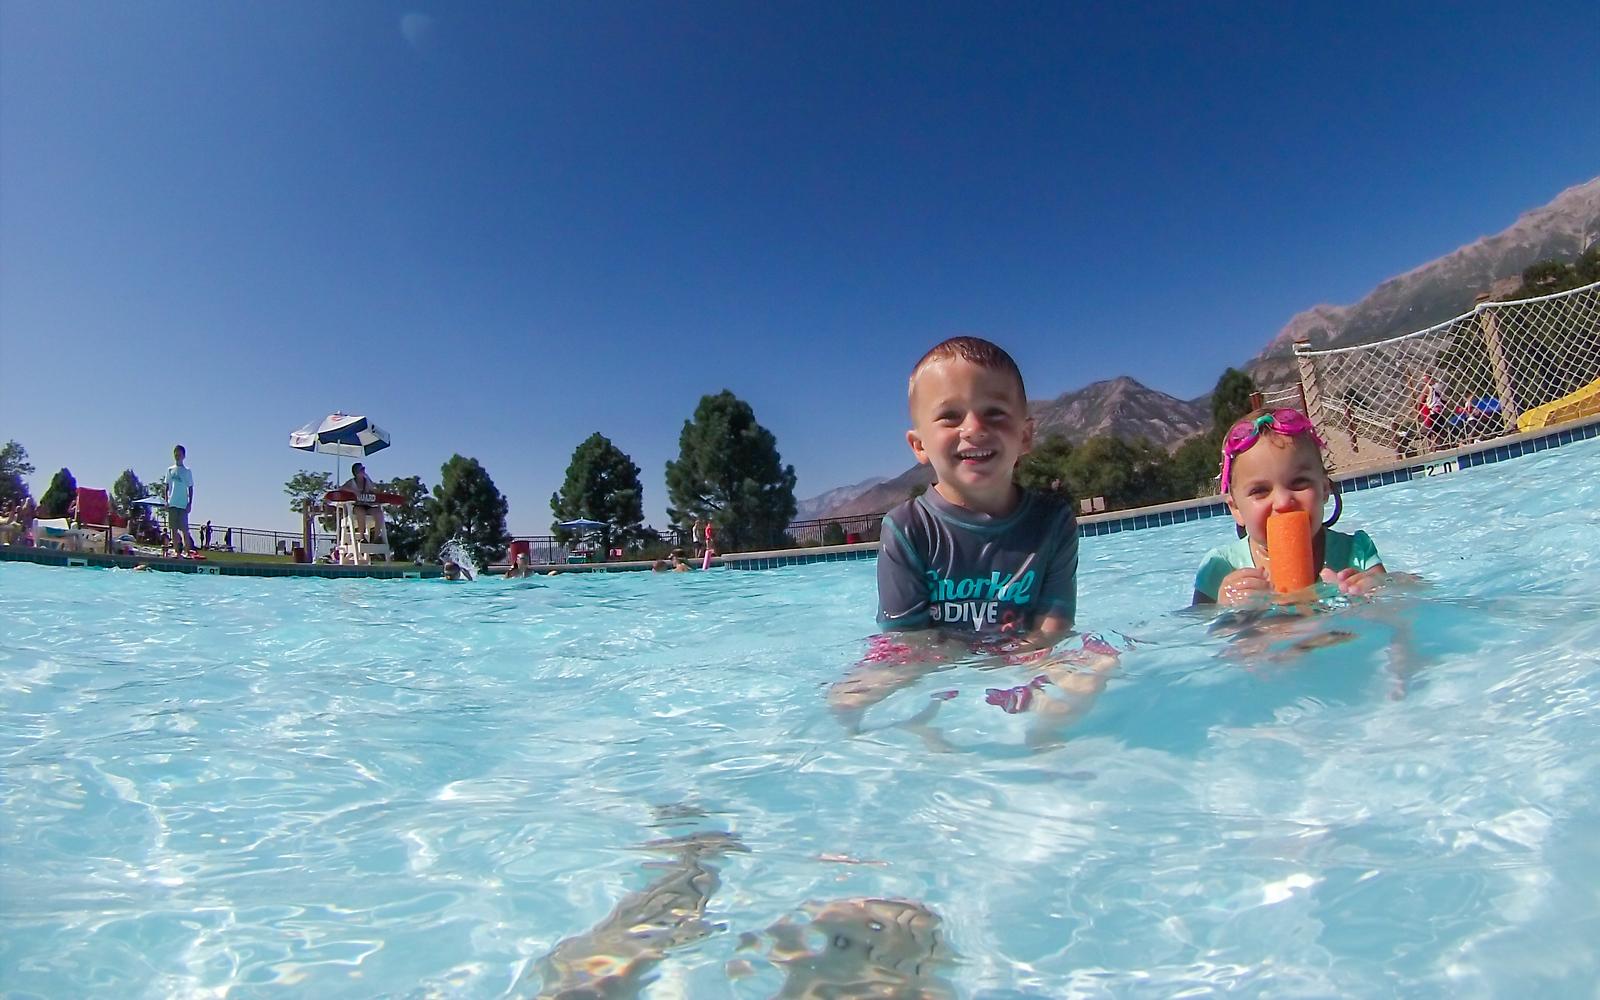 Pool Time - July 29